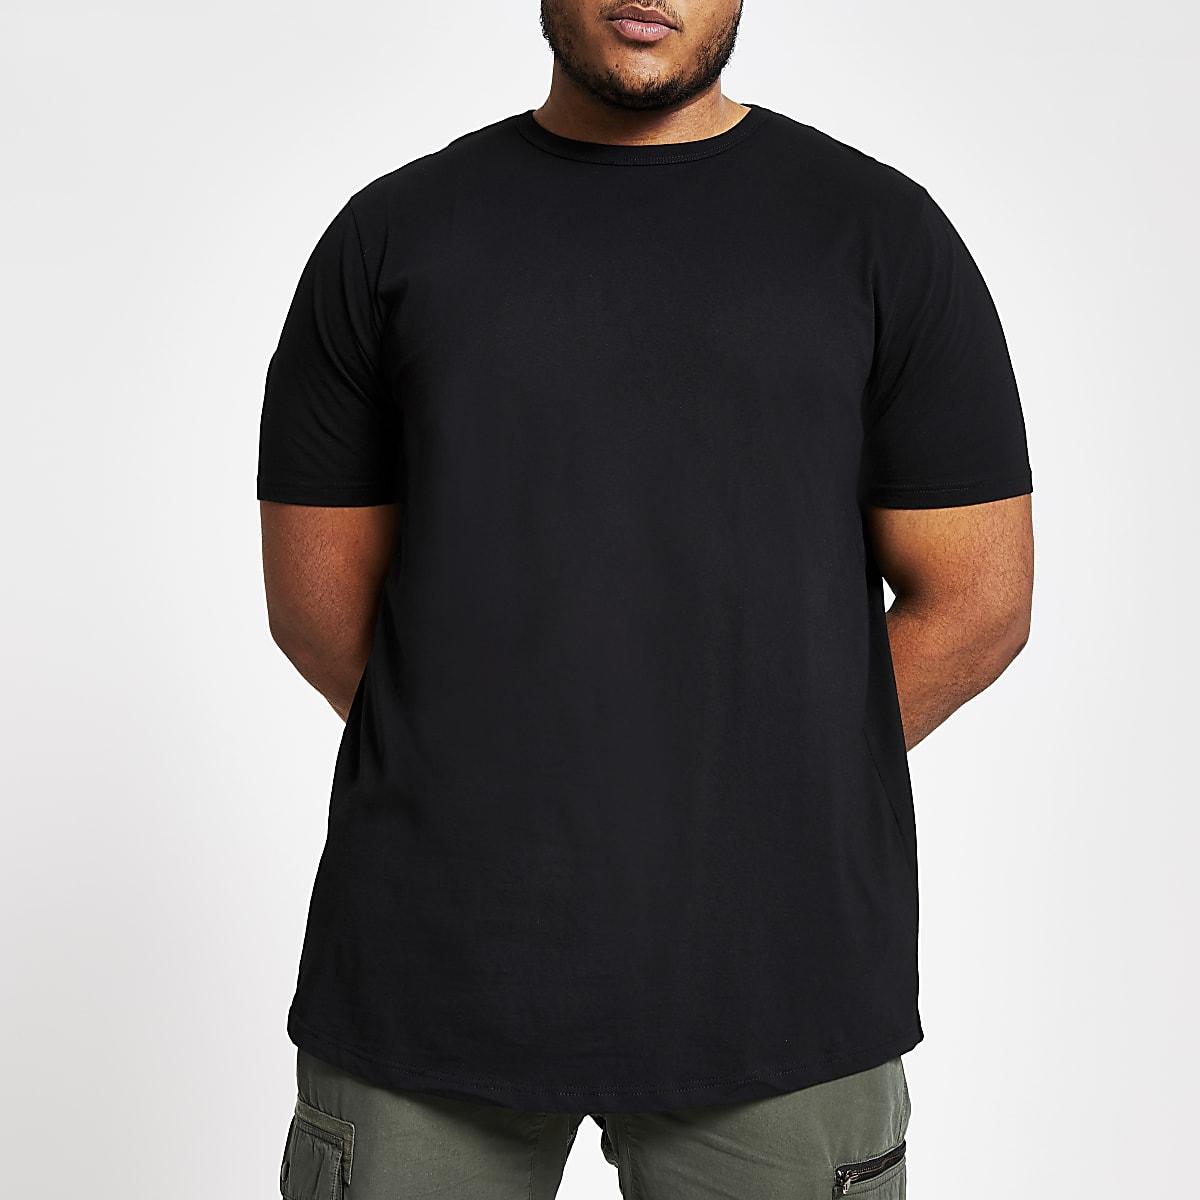 Big & Tall – Schwarzes T-Shirt mit abgerundetem Saum